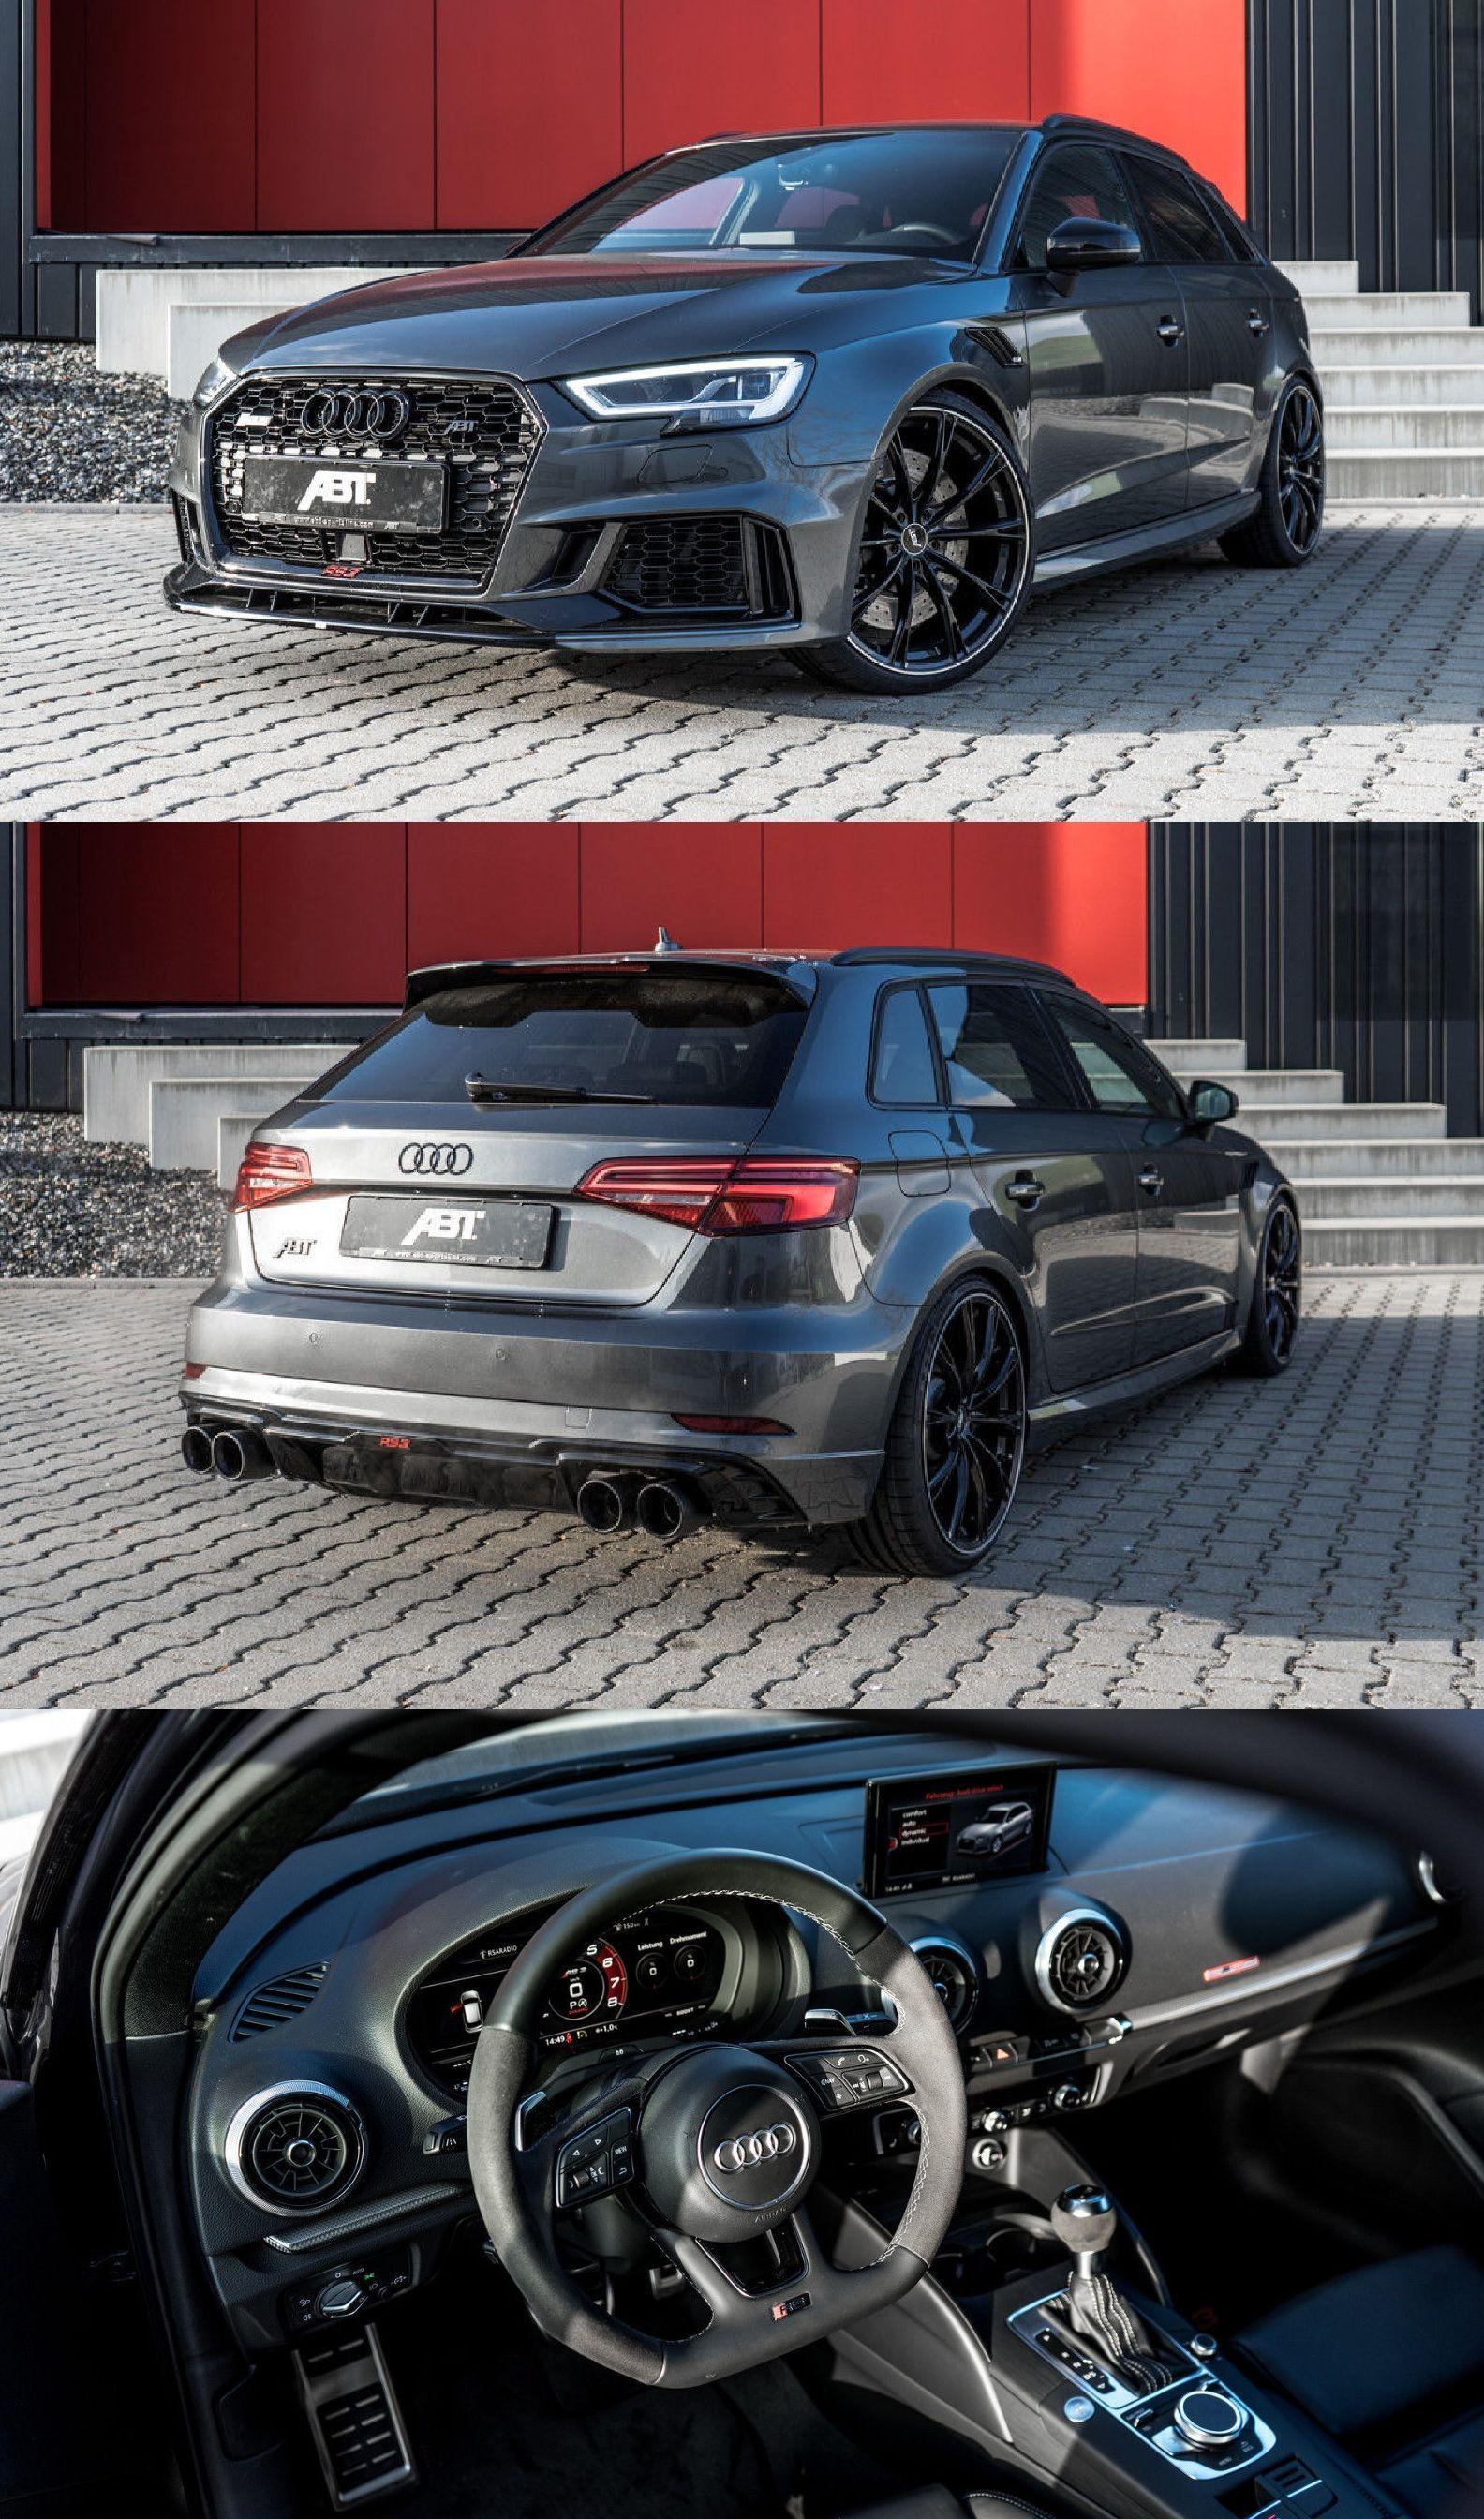 Audi A3 Sportback Audi A3 Sportback In 2020 Audi A3 Sportback Audi Rs3 Audi Sportback